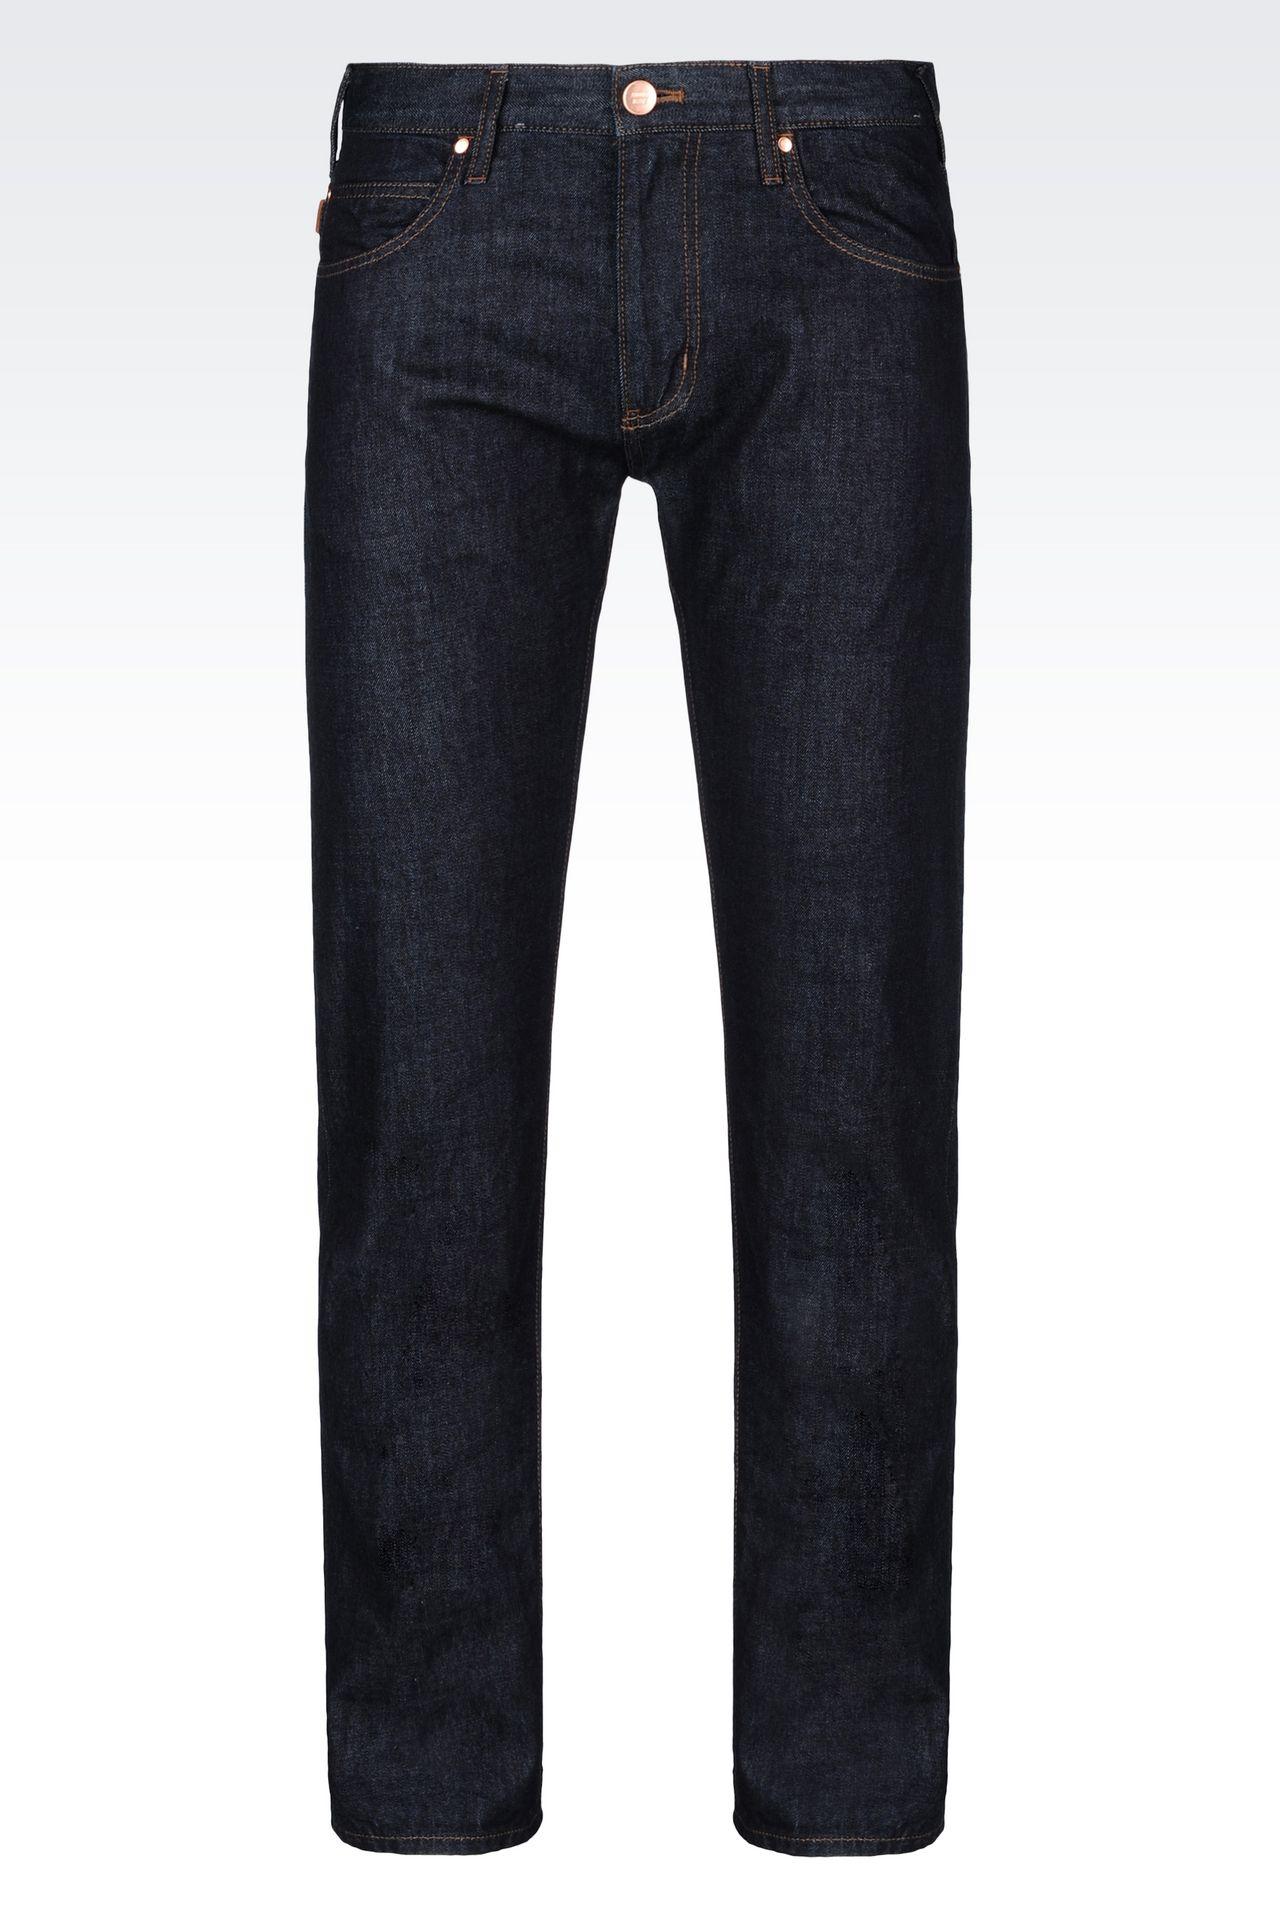 Men&39s jeans Armani Jeans designer jeans - Armani.com